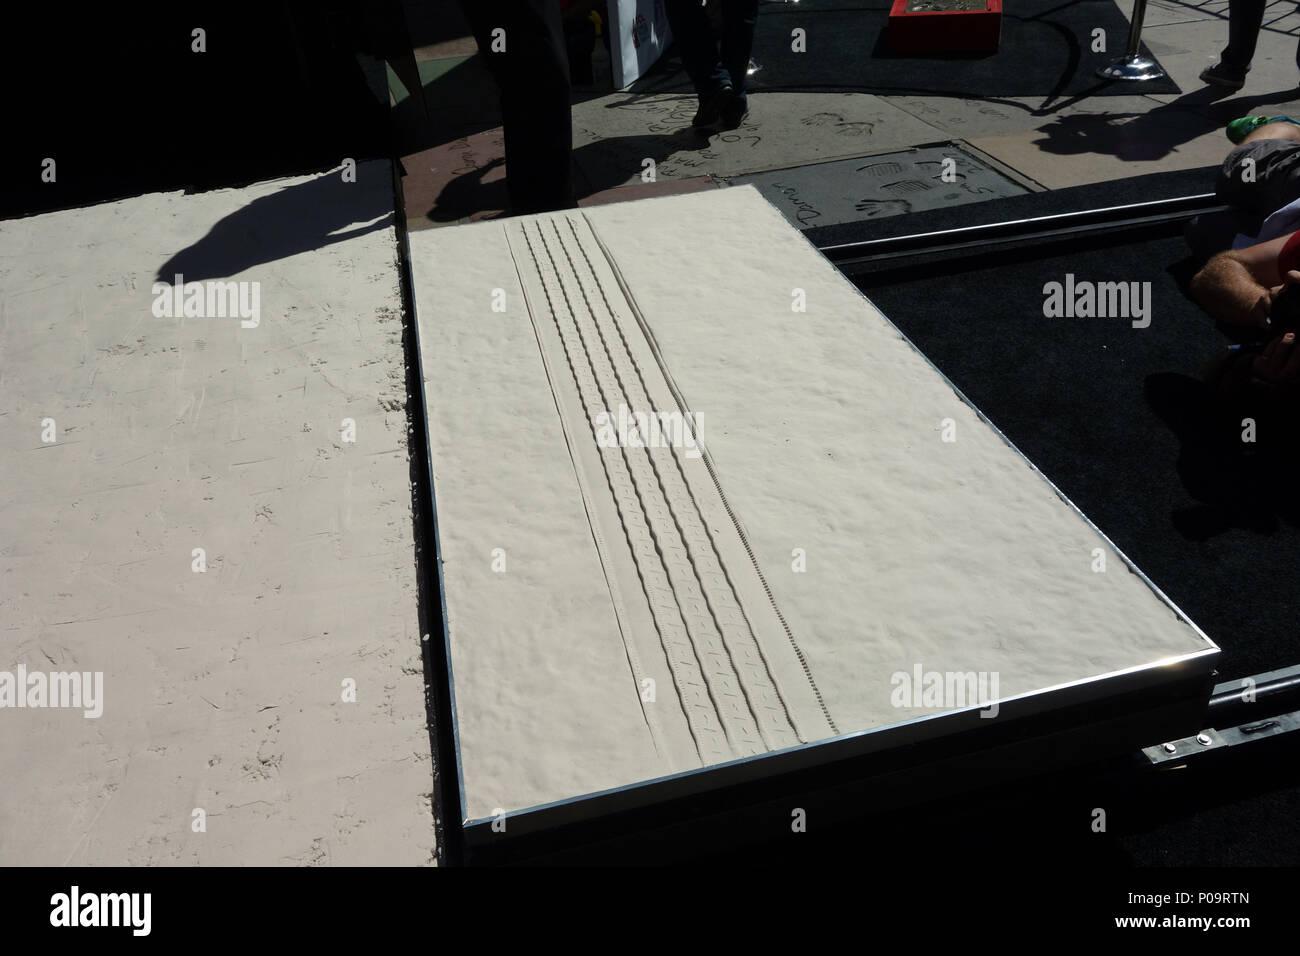 Handprint Footprint Stockfotos & Handprint Footprint Bilder - Seite ...